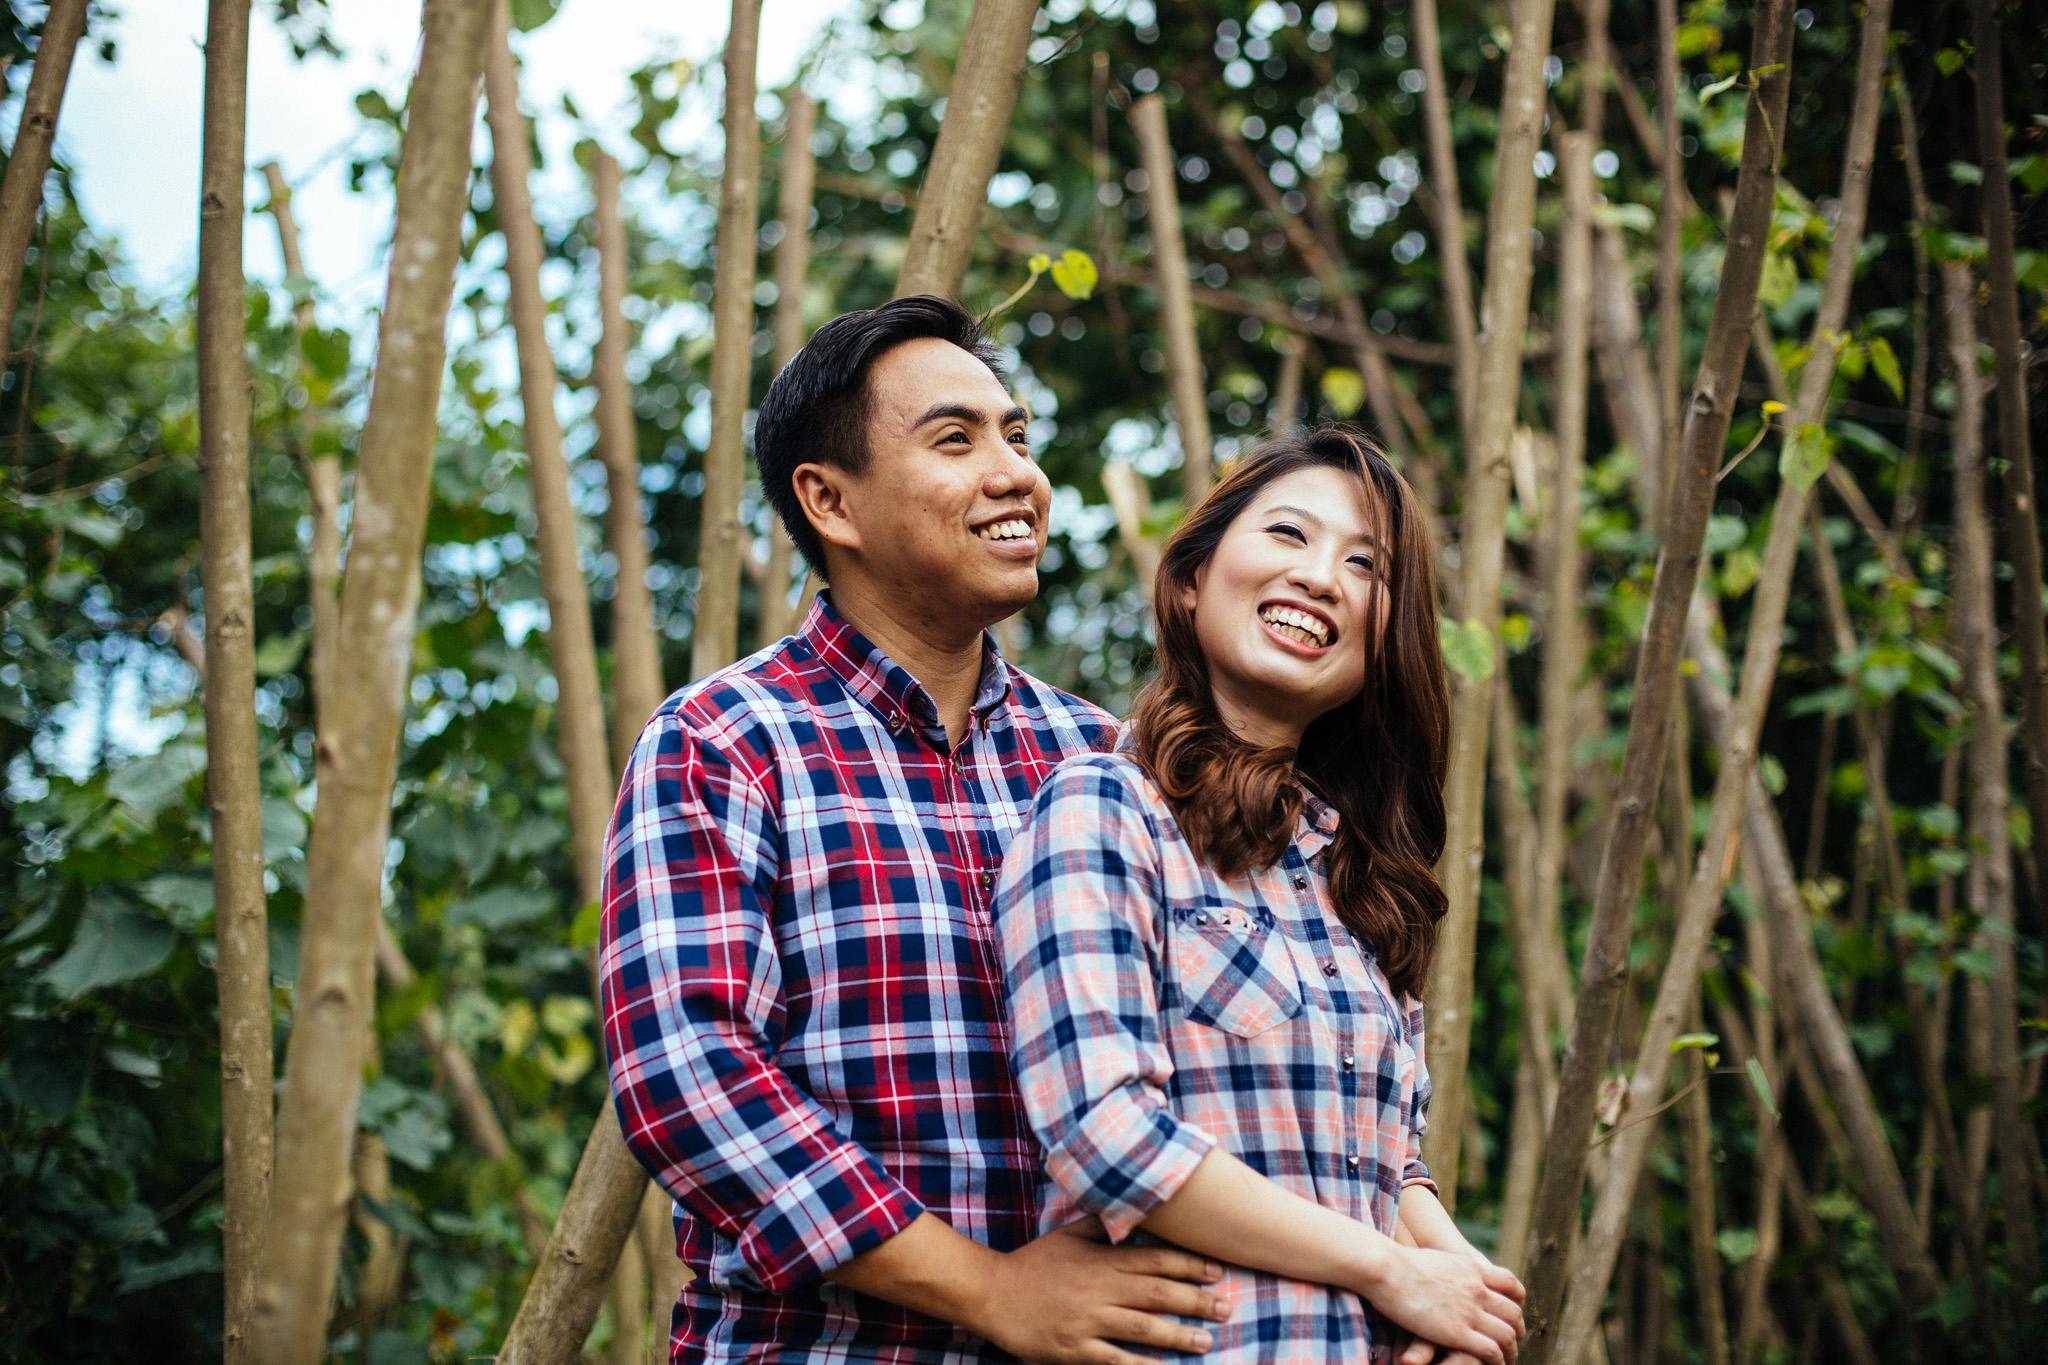 singapore--wedding-photographer-commercial-editorial-travel-wemadethese-firdaus-sasha-sessions-01.jpg